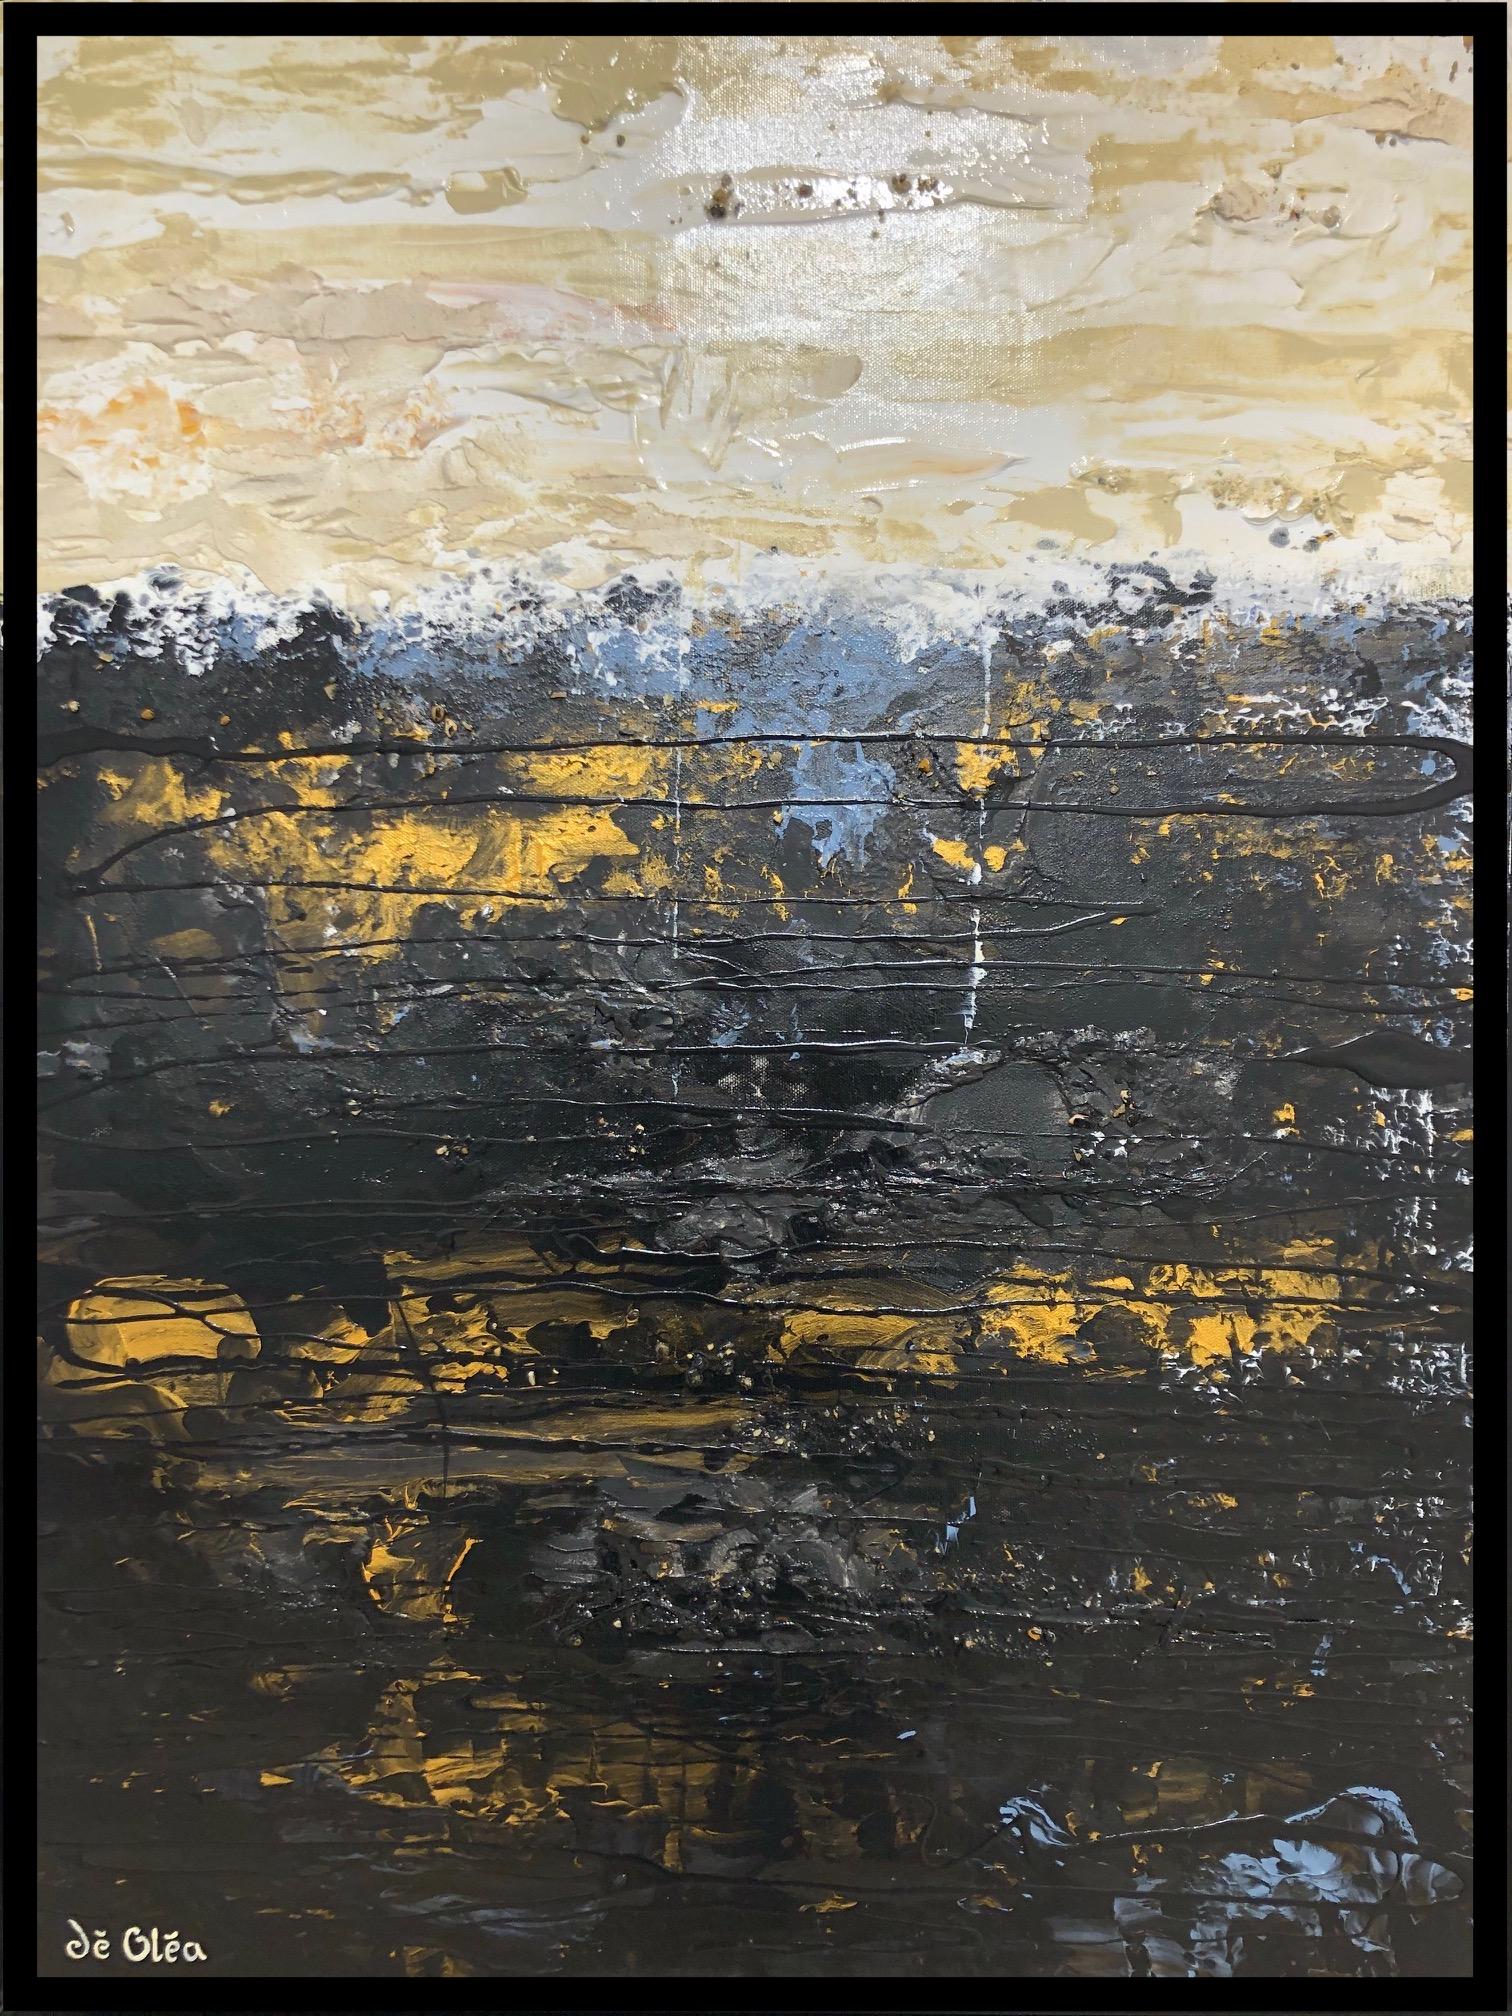 De Olea en collection chez Galerie Maxanart Valbonne